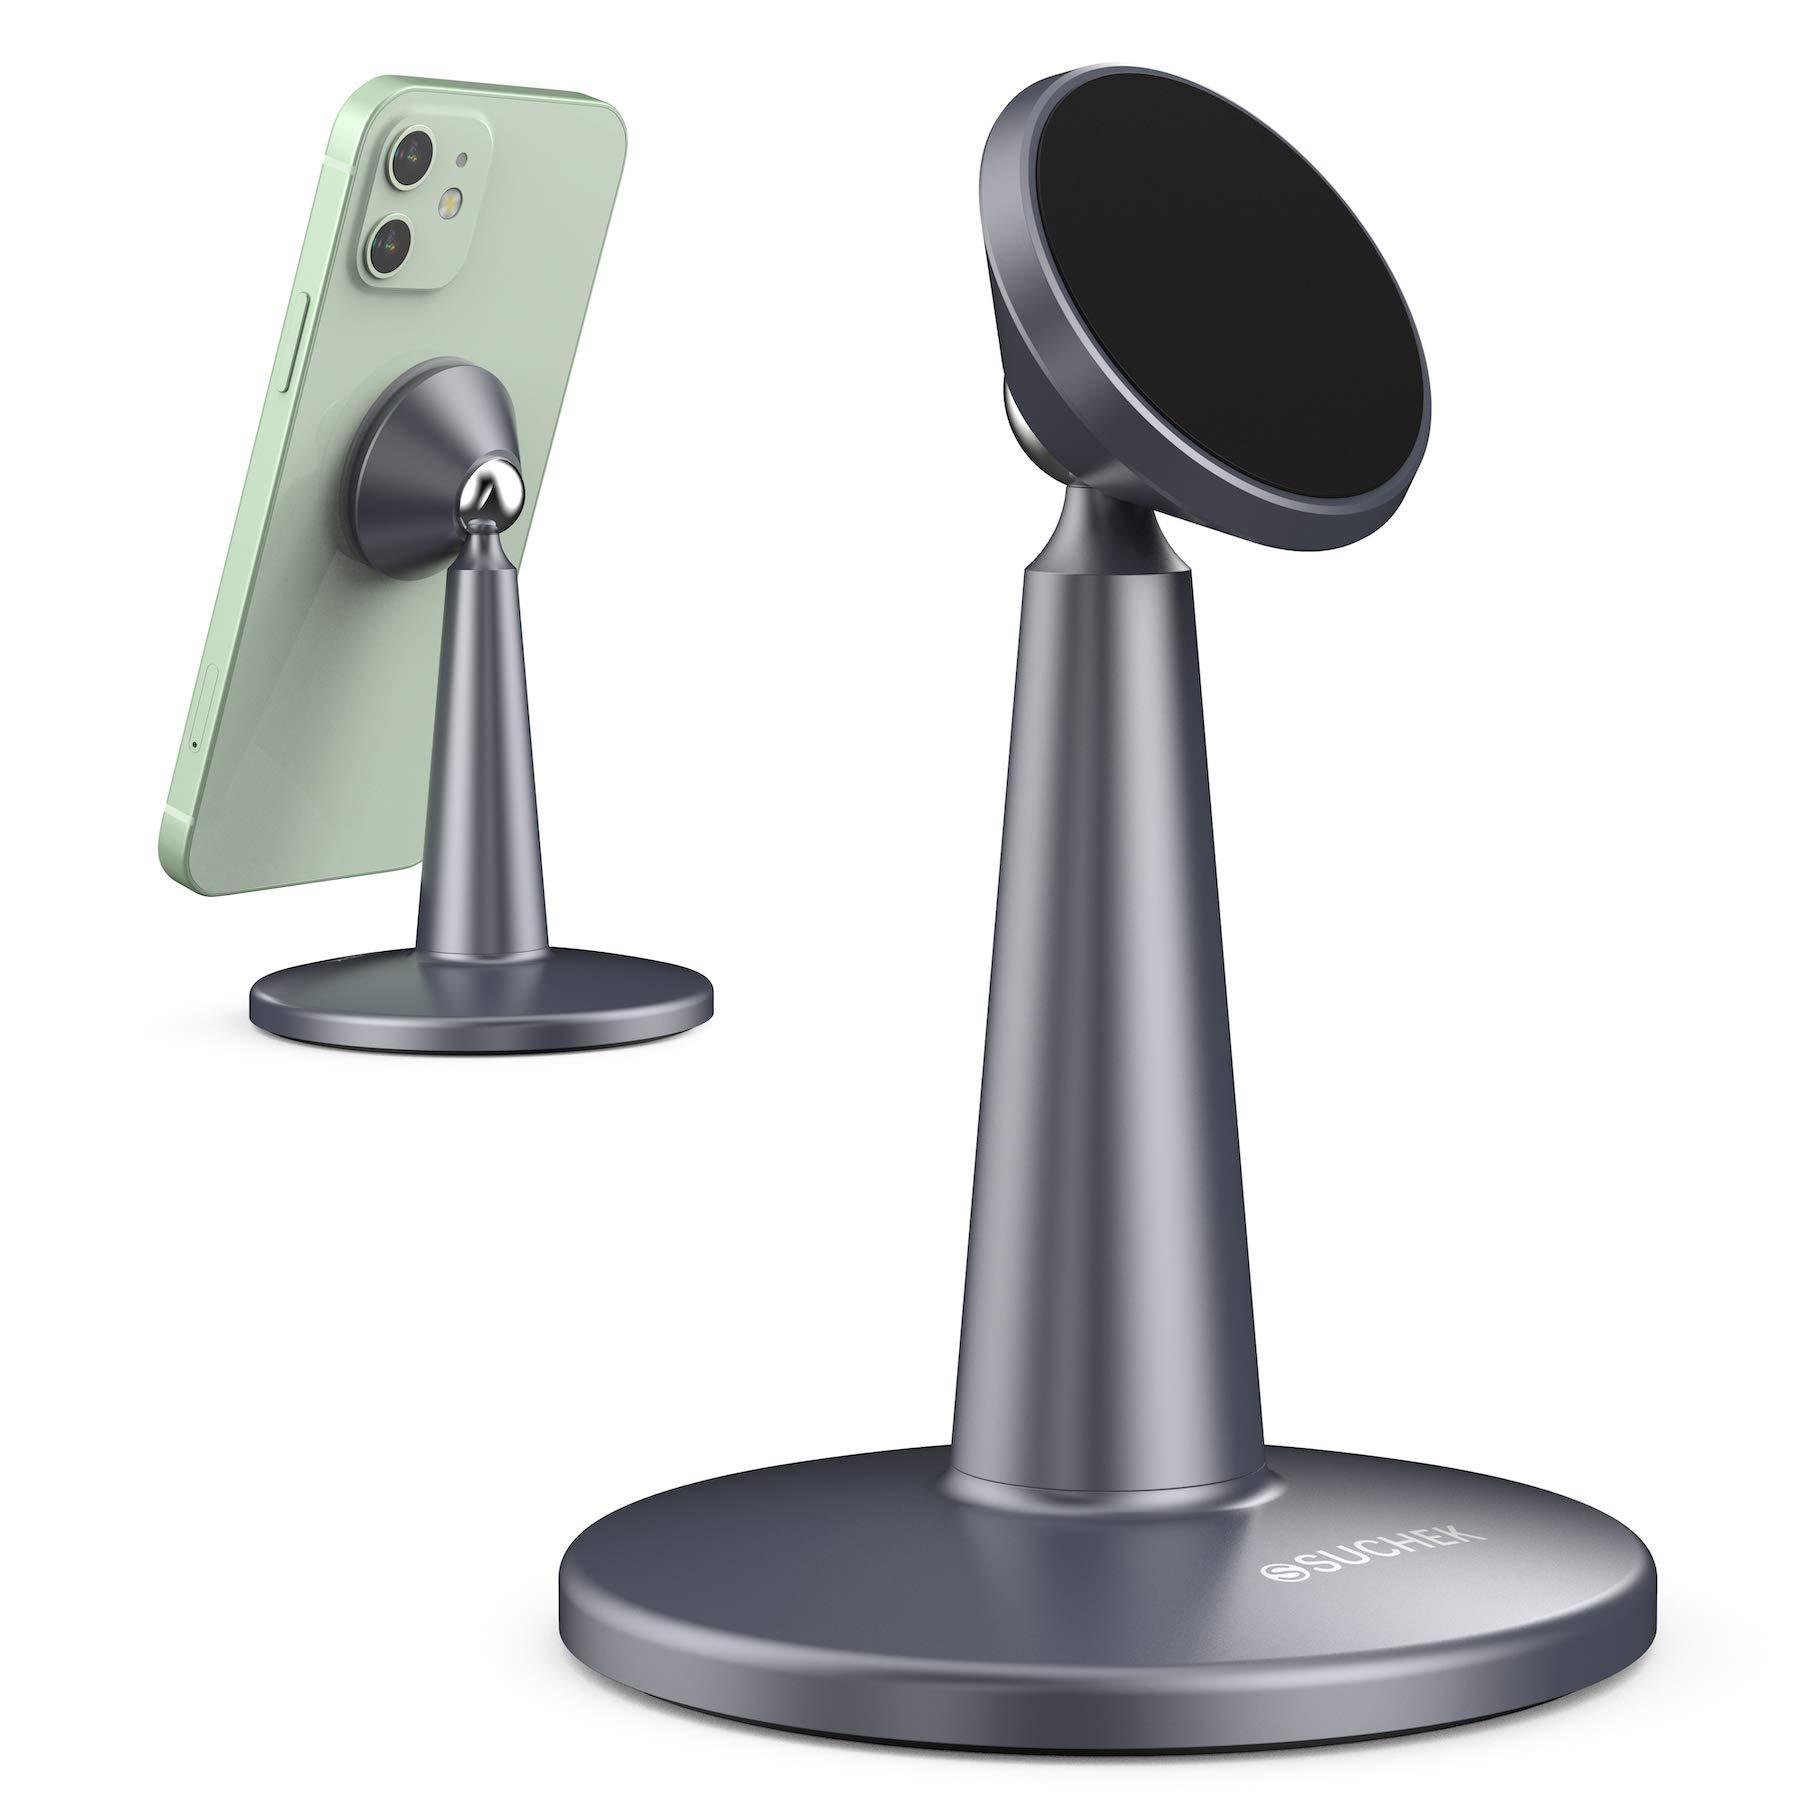 Suchek Magnetic Cell Phone Stand for Desk Adjustable Aluminum Desktop Stand Compatible